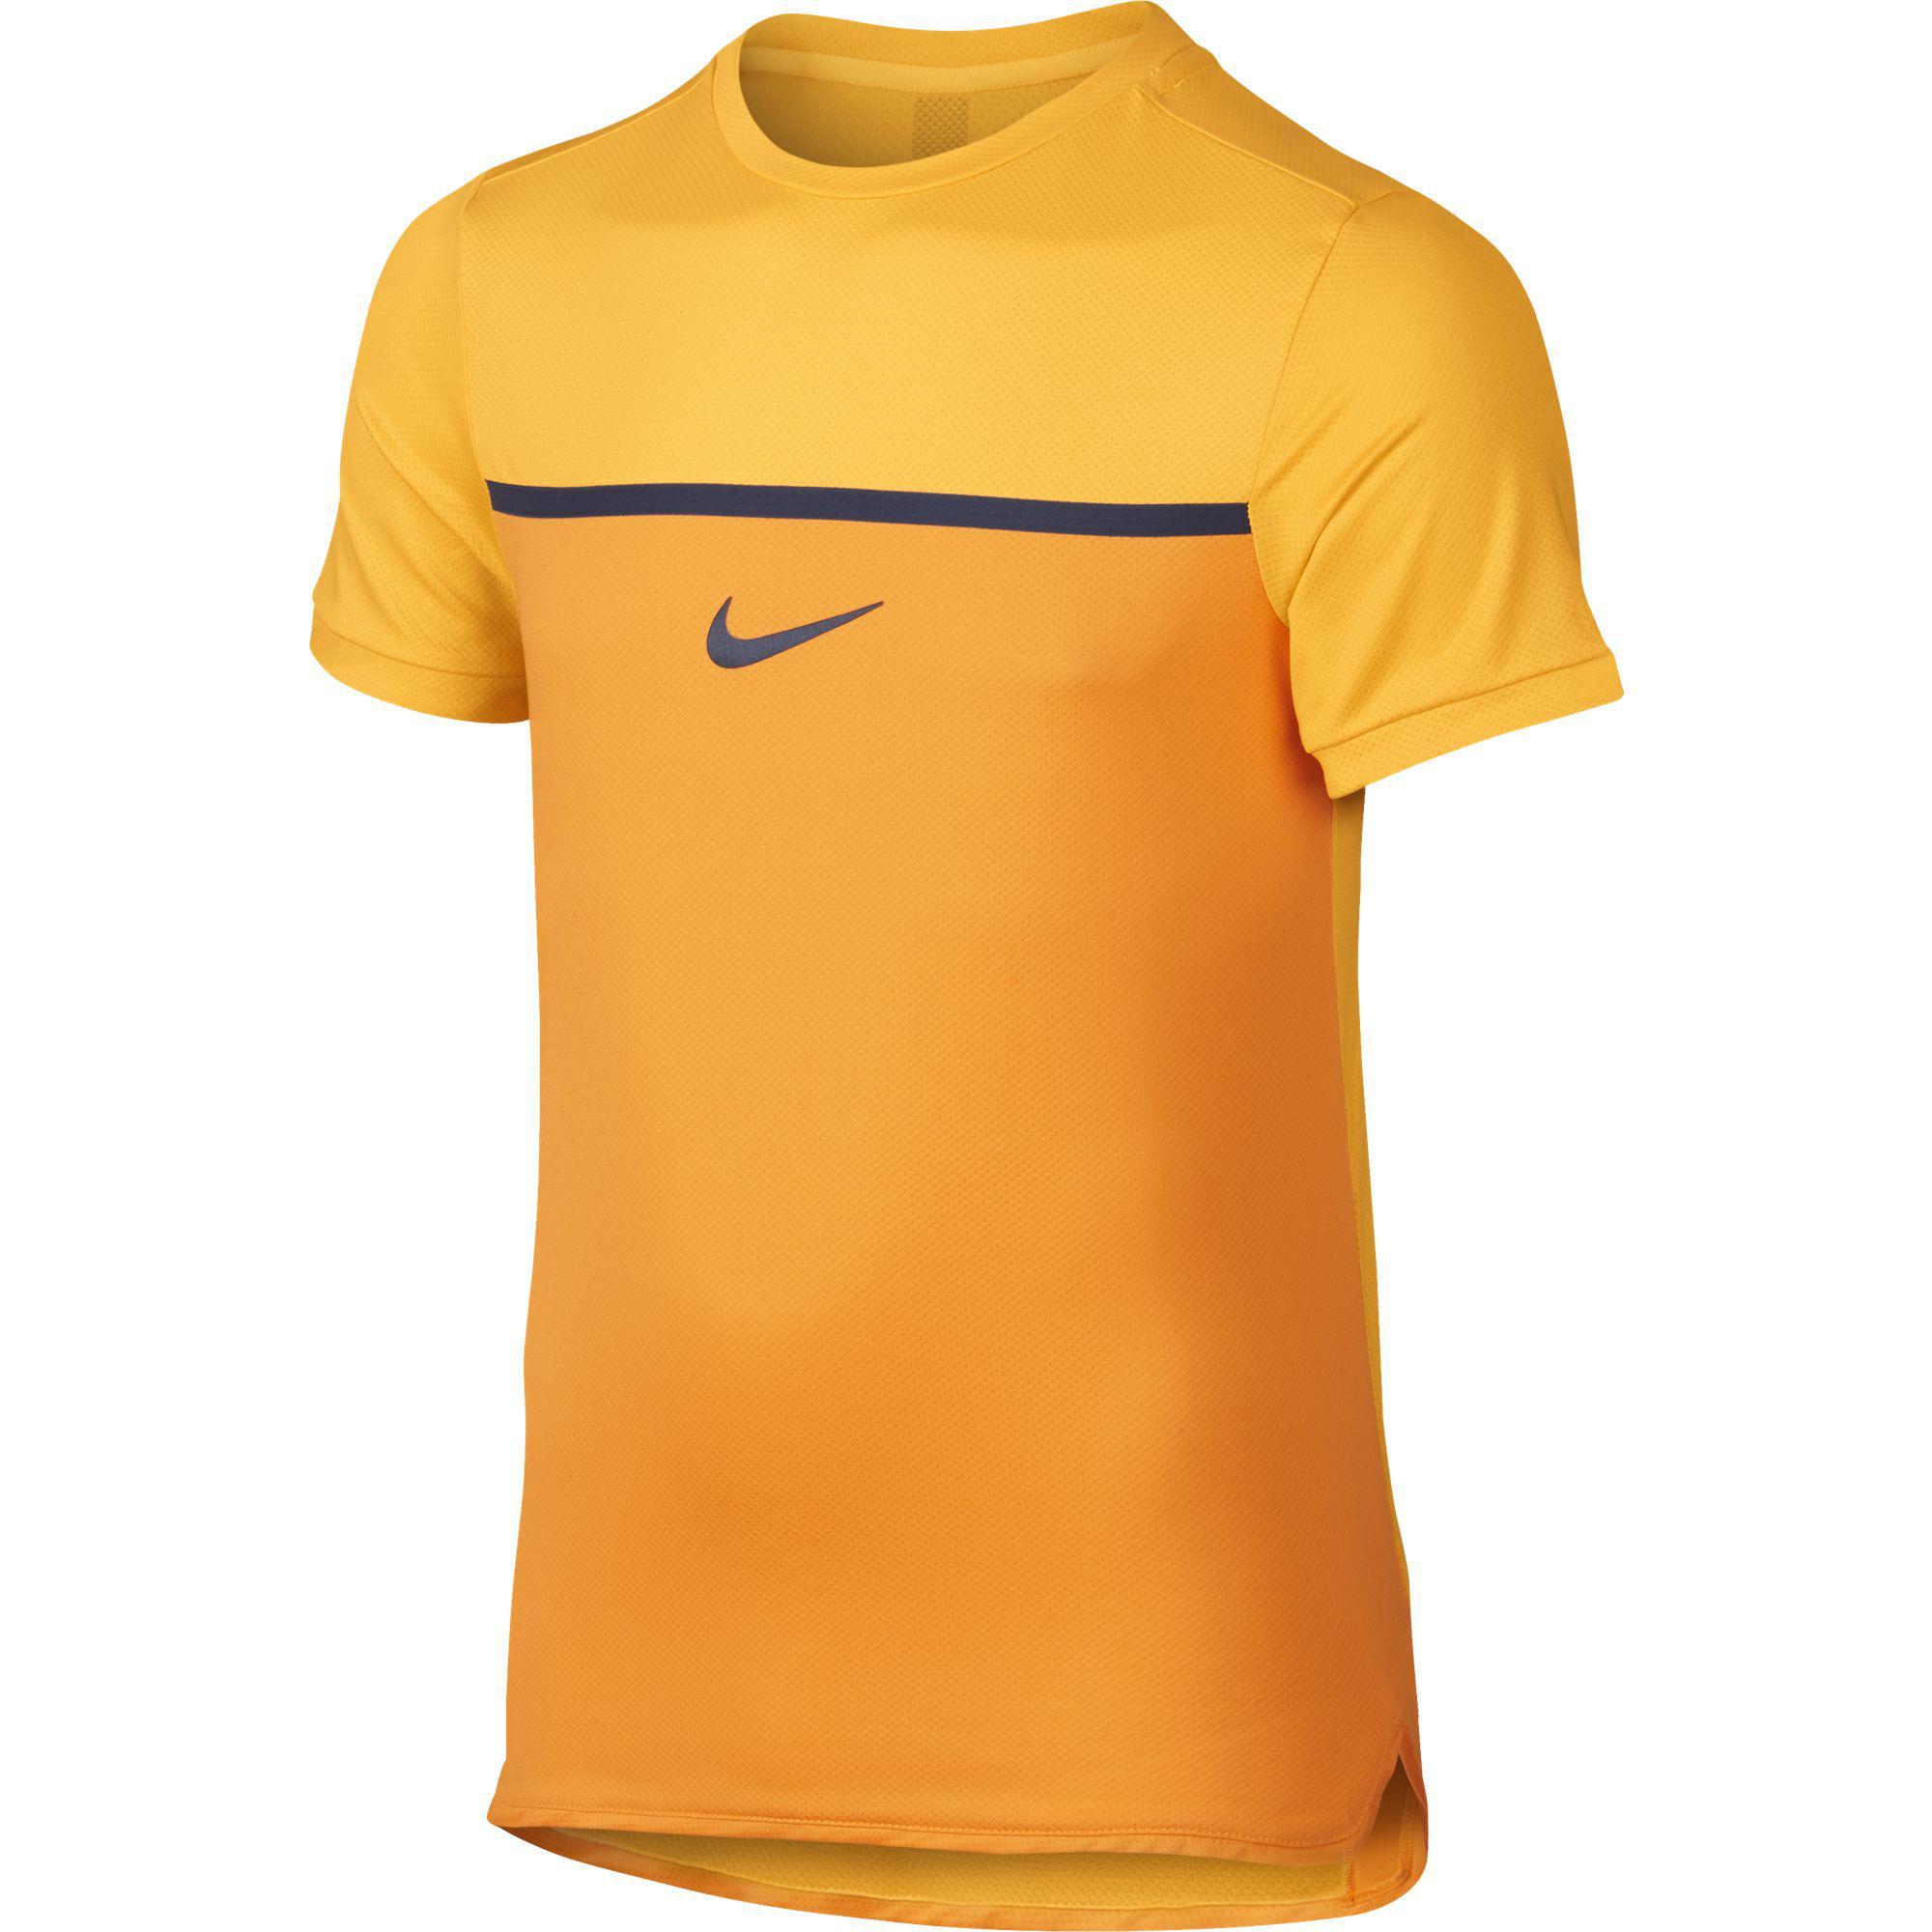 77b1da8dcfaf Nike Boys Challenger Premier Rafa Crew - Orange - Tennisnuts.com